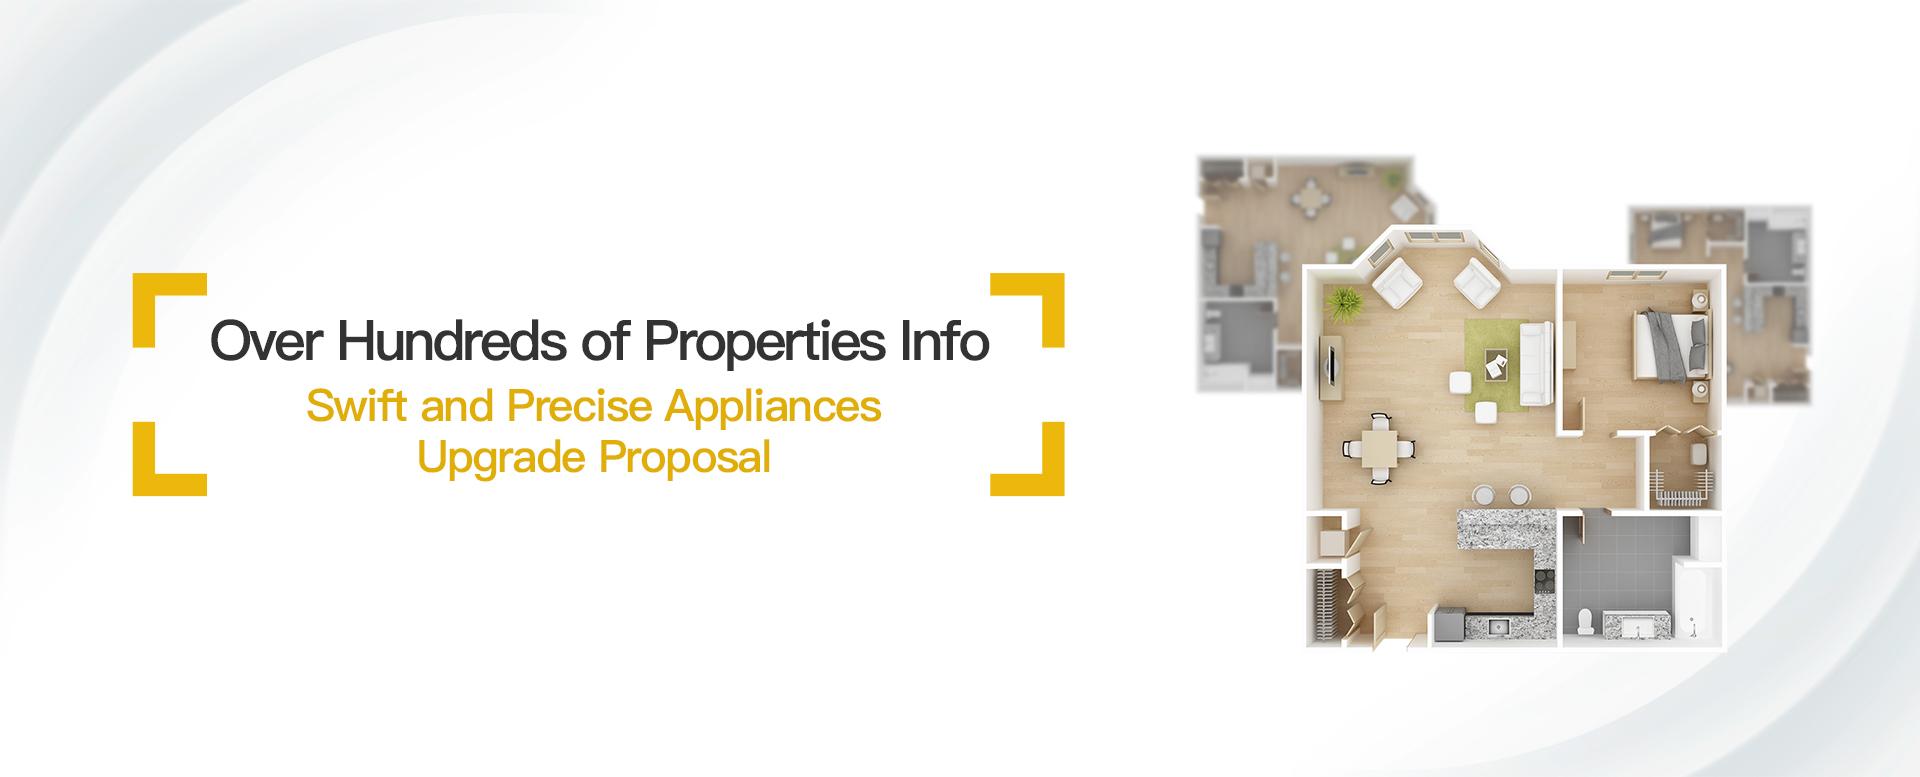 Over Hundreds of Properties Info